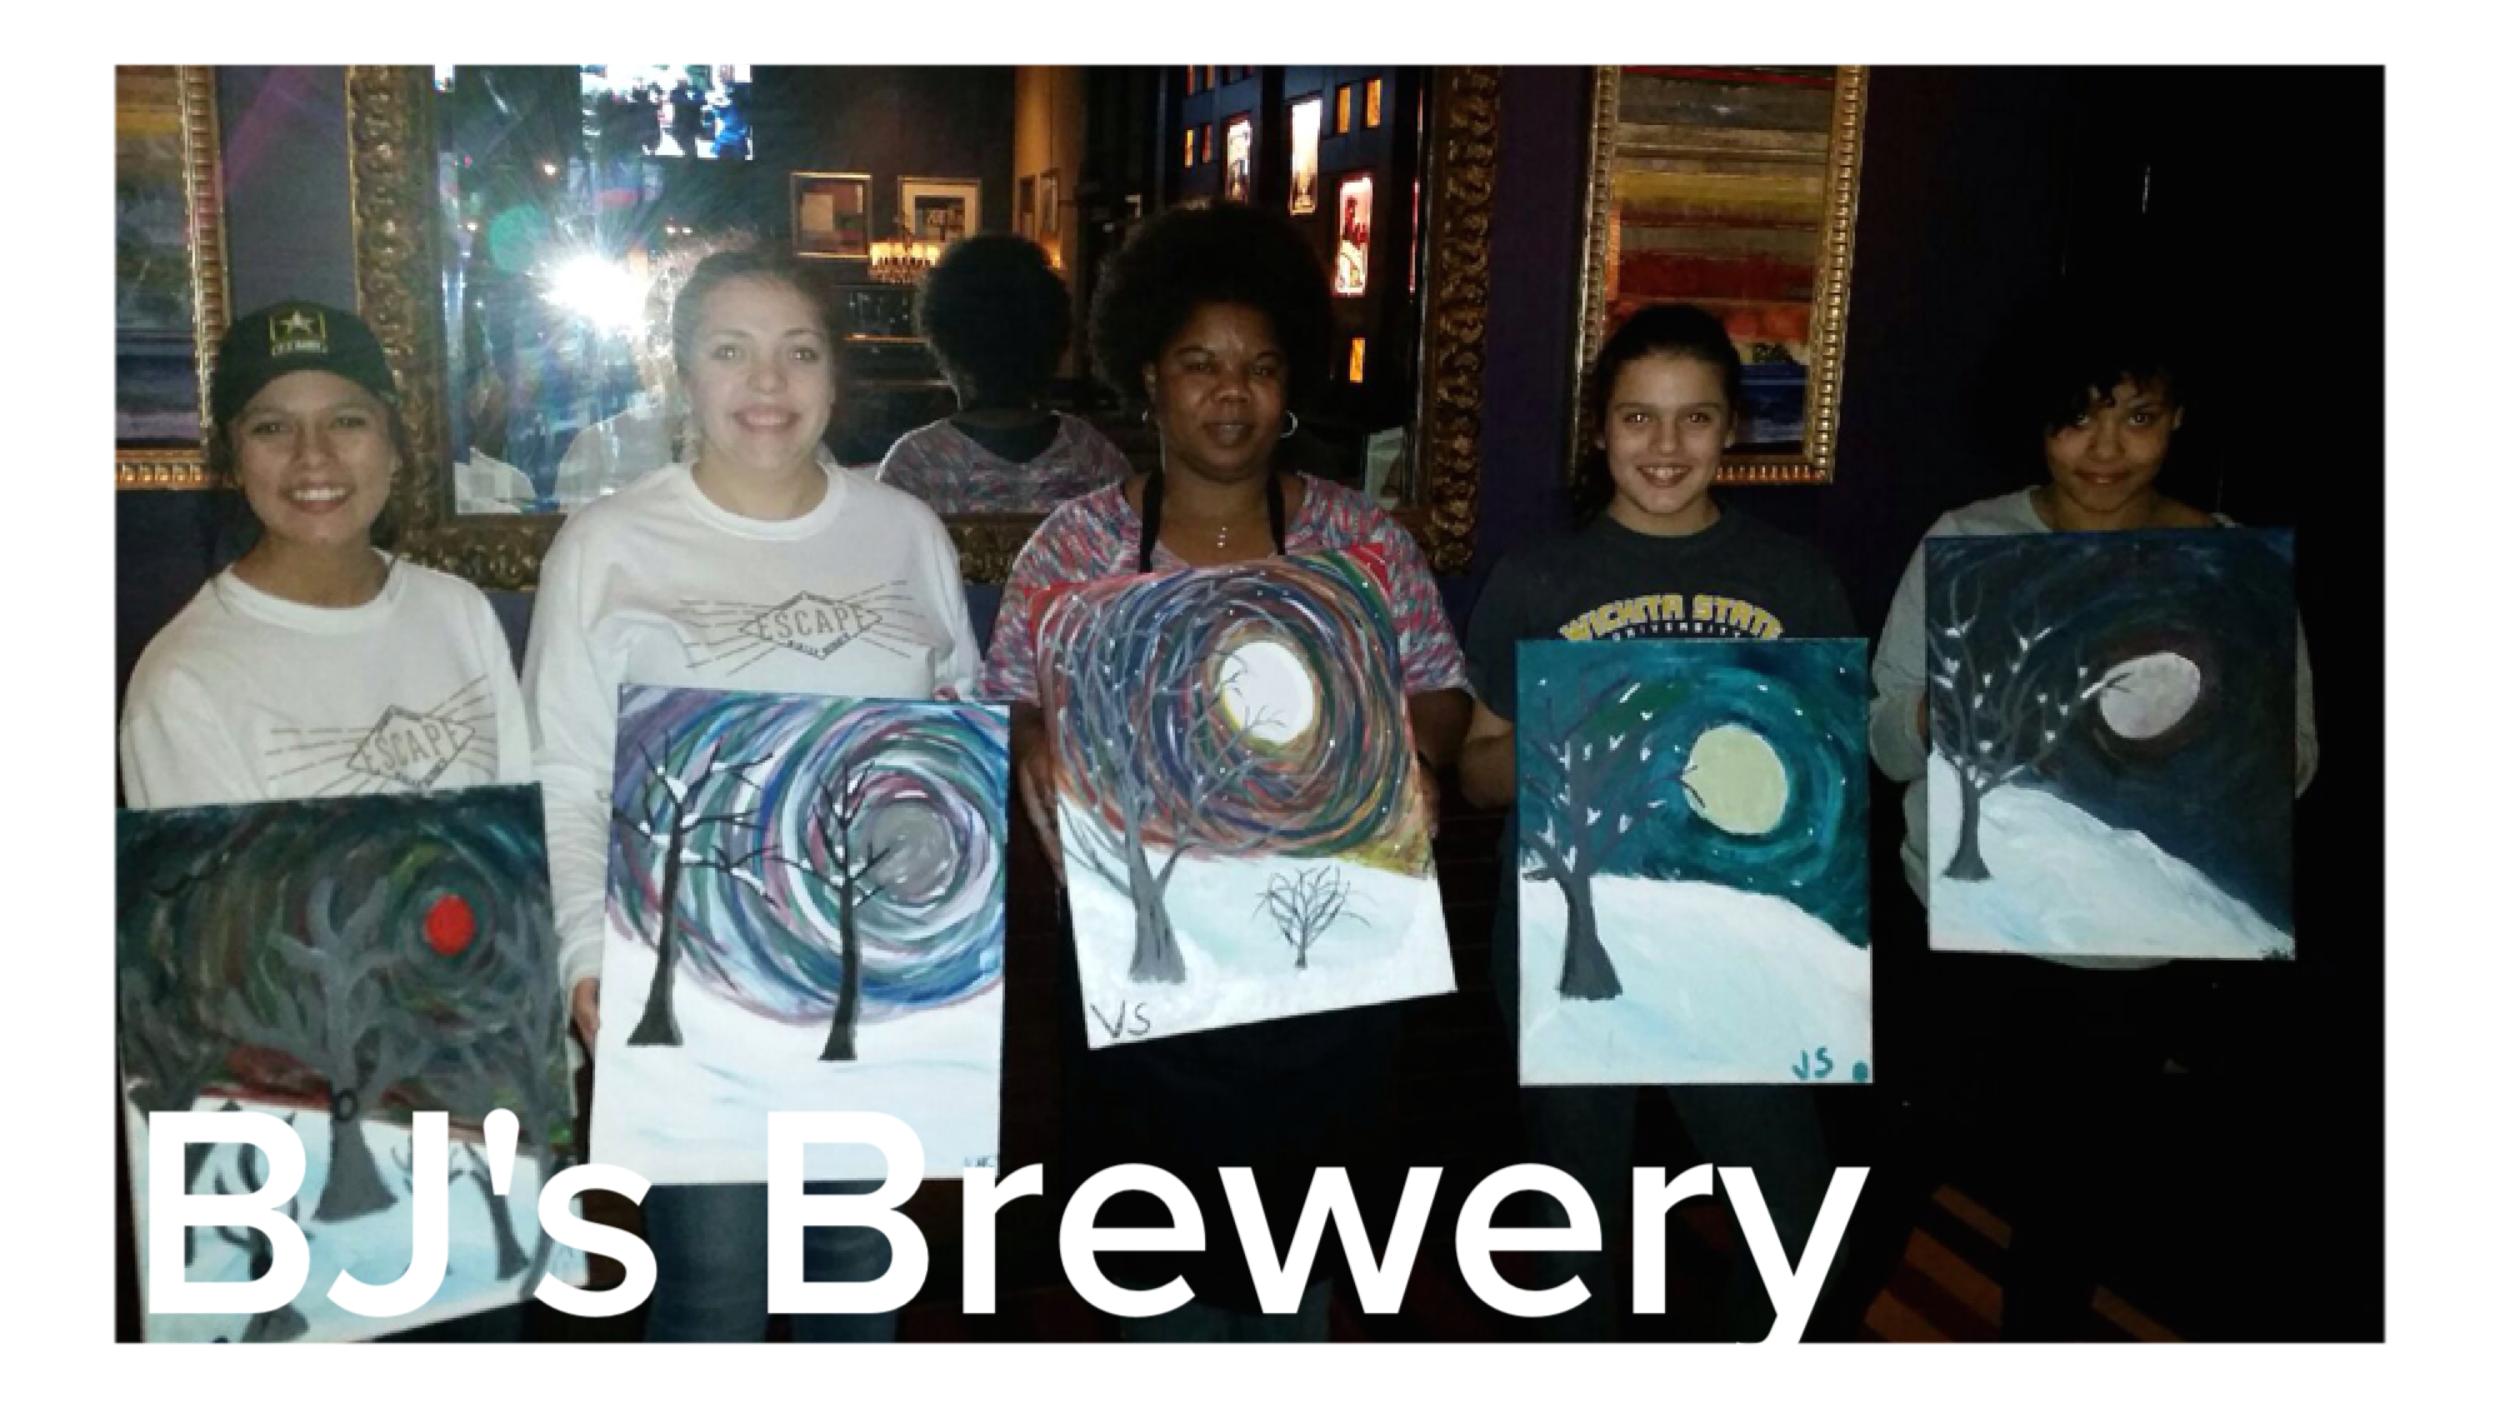 BJ's Brewery Wichita, KS